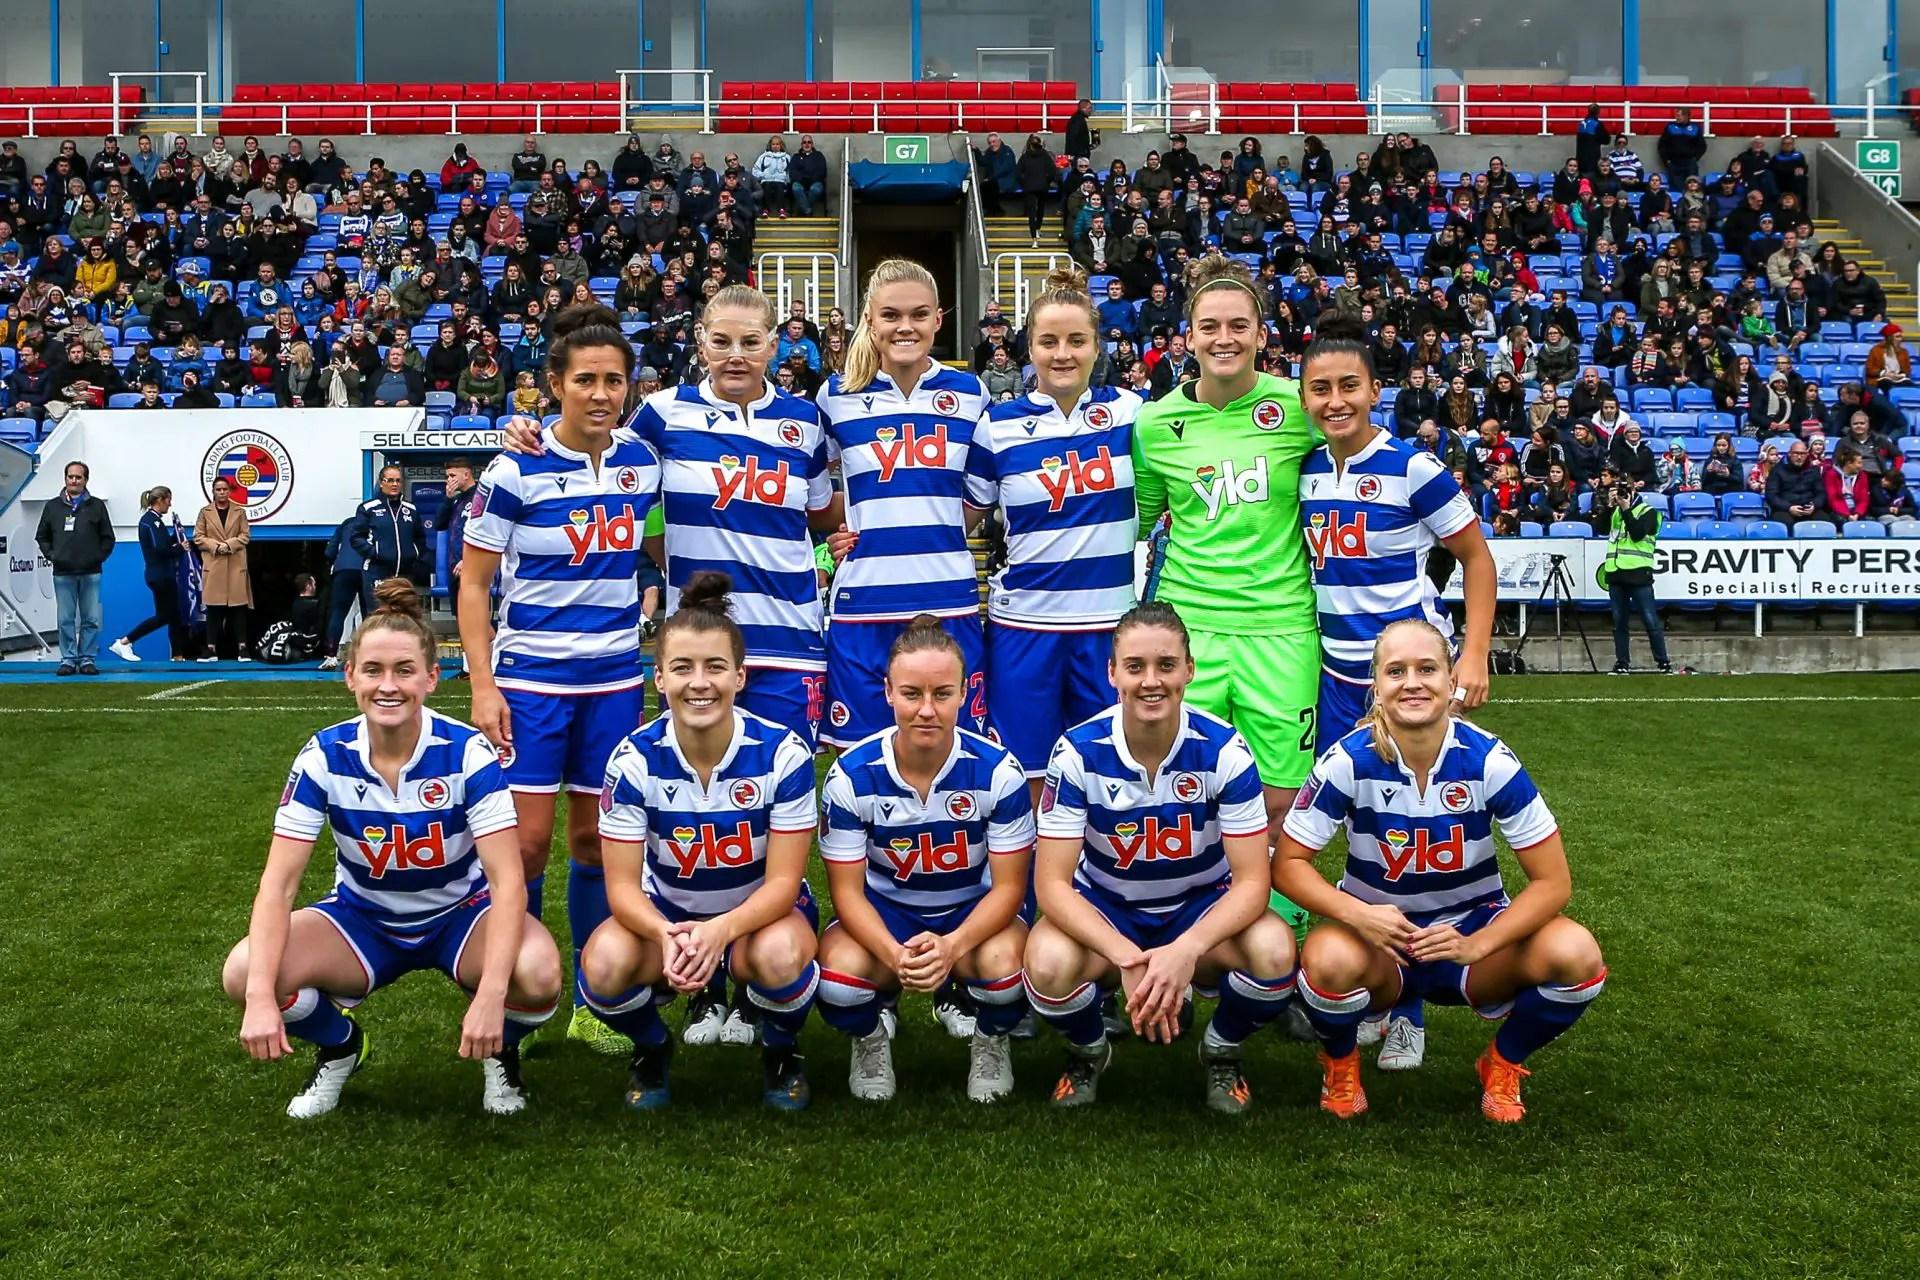 Women's Football Weekend brings Bristol City to Reading FC Women